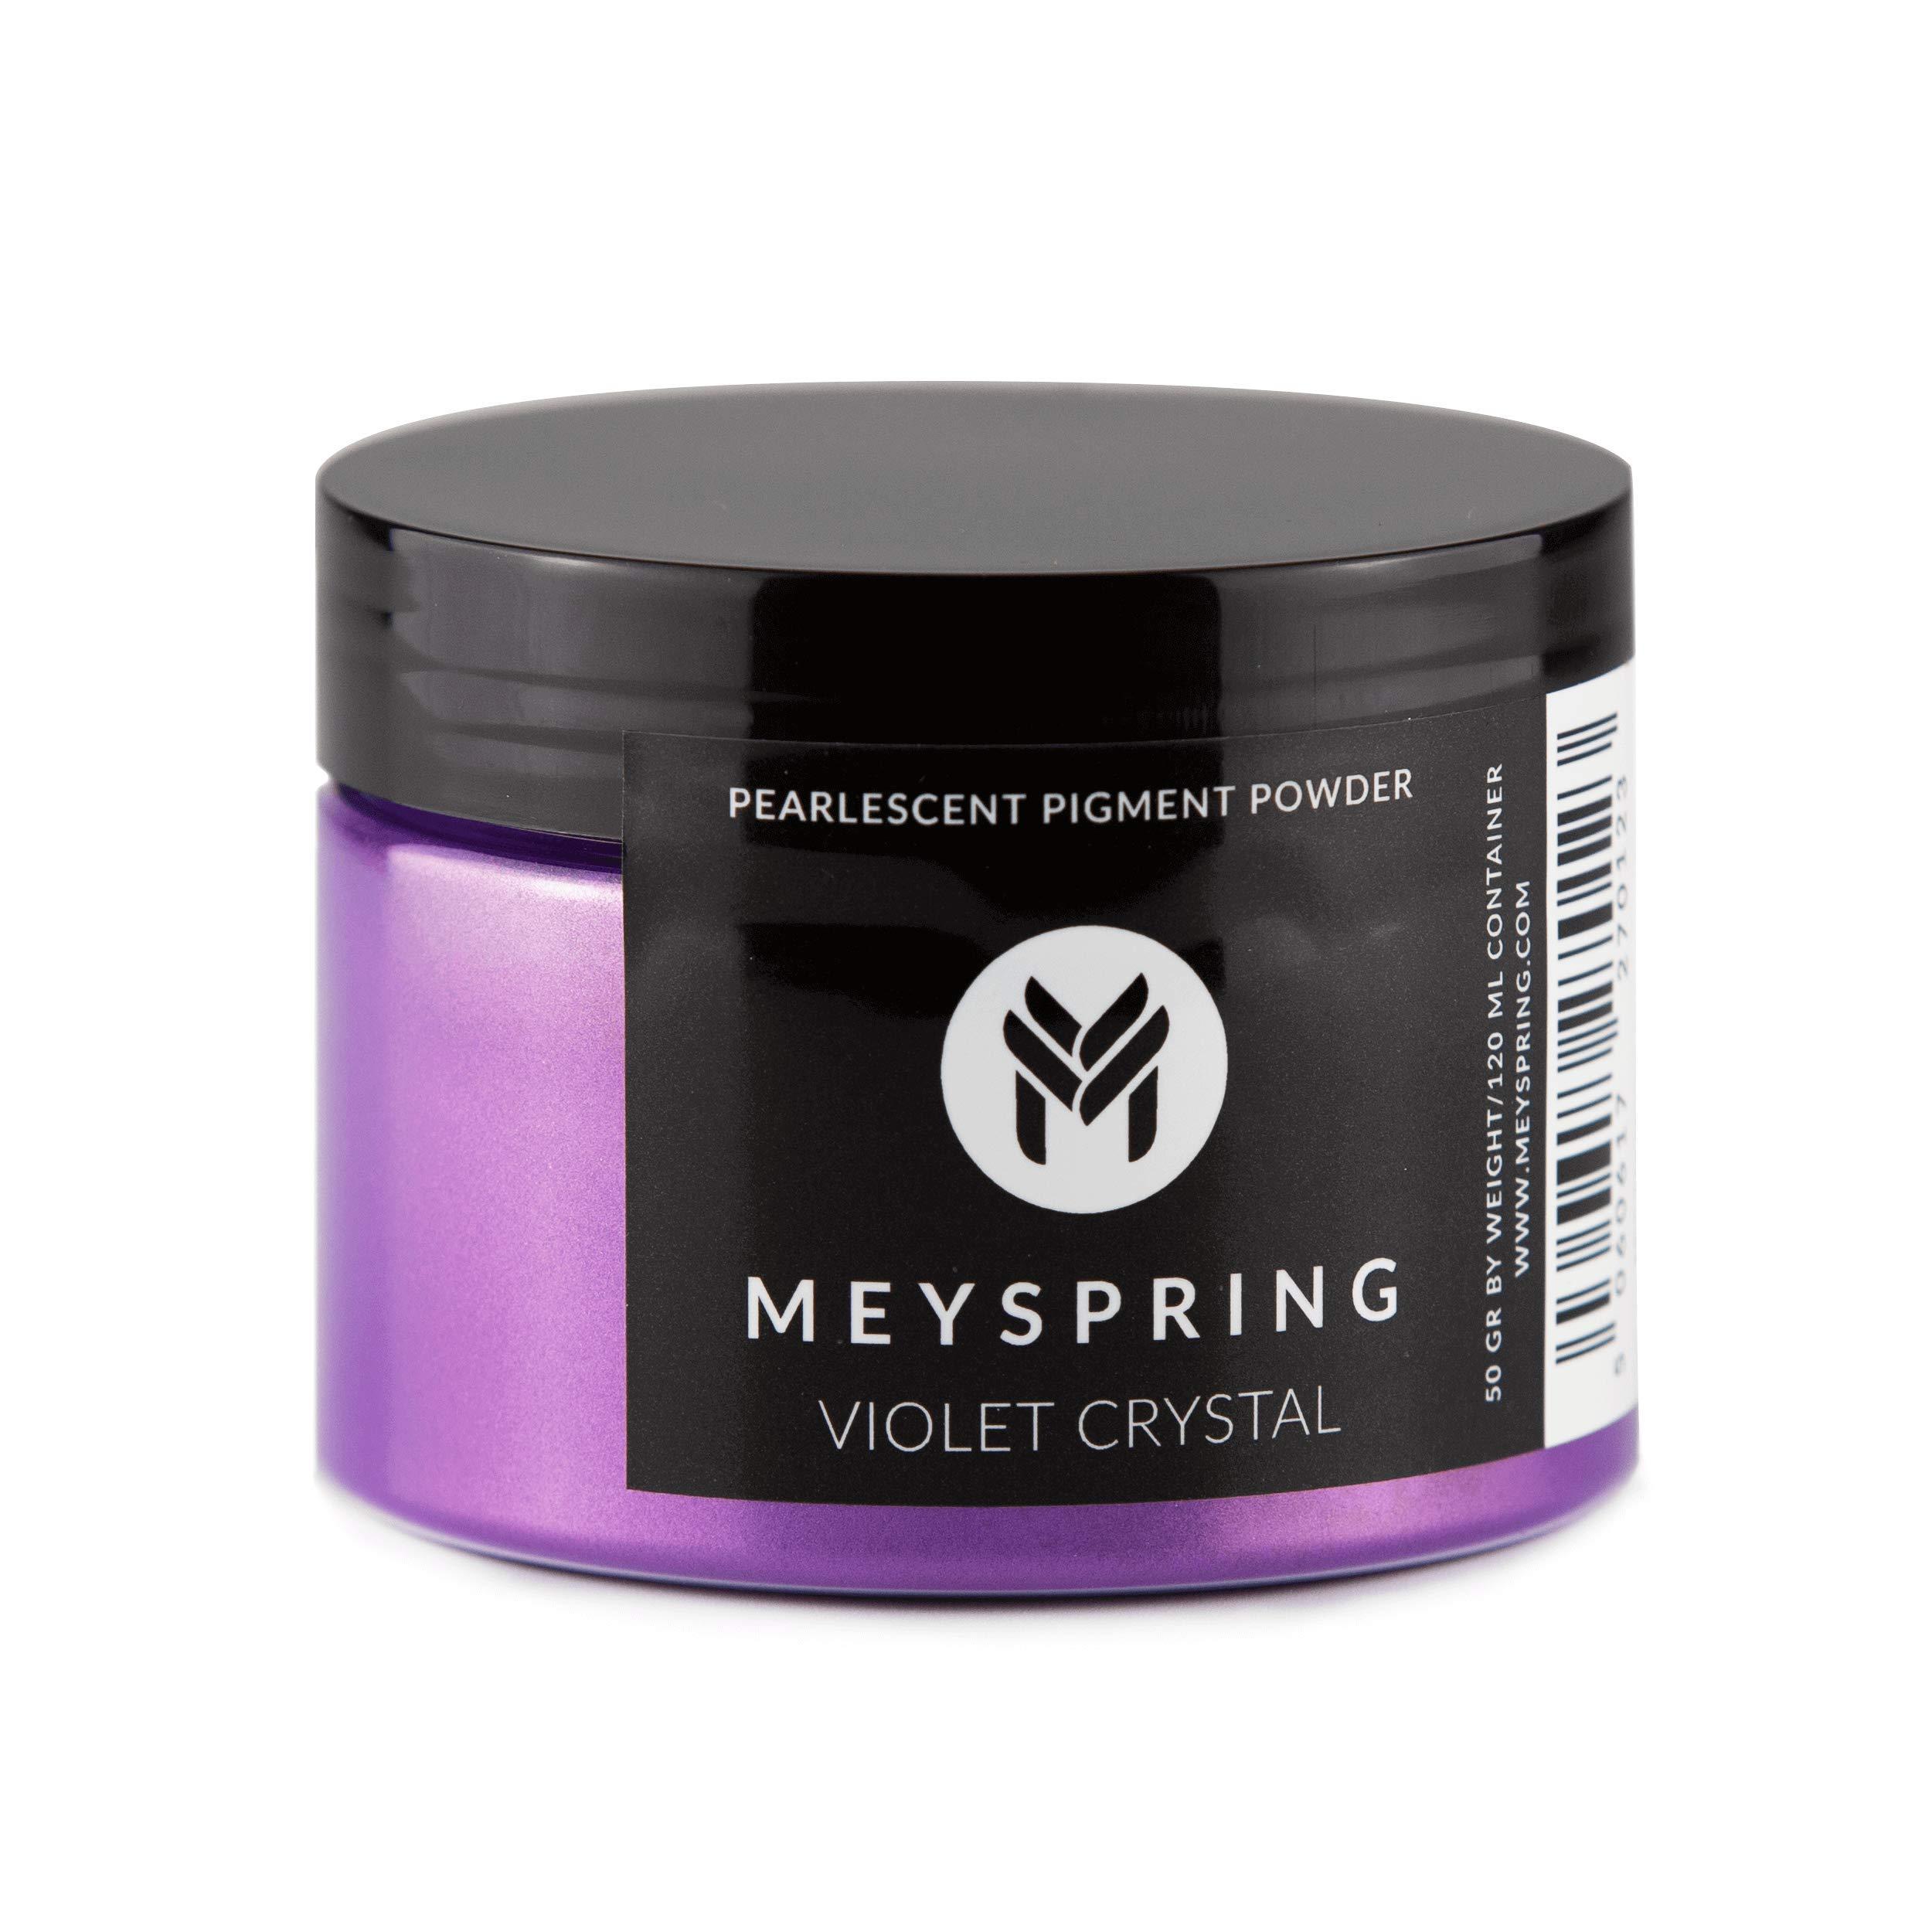 MEYSPRING Violet Crystal Epoxy Resin Color Pigment - 50g - Mica Powder for Epoxy